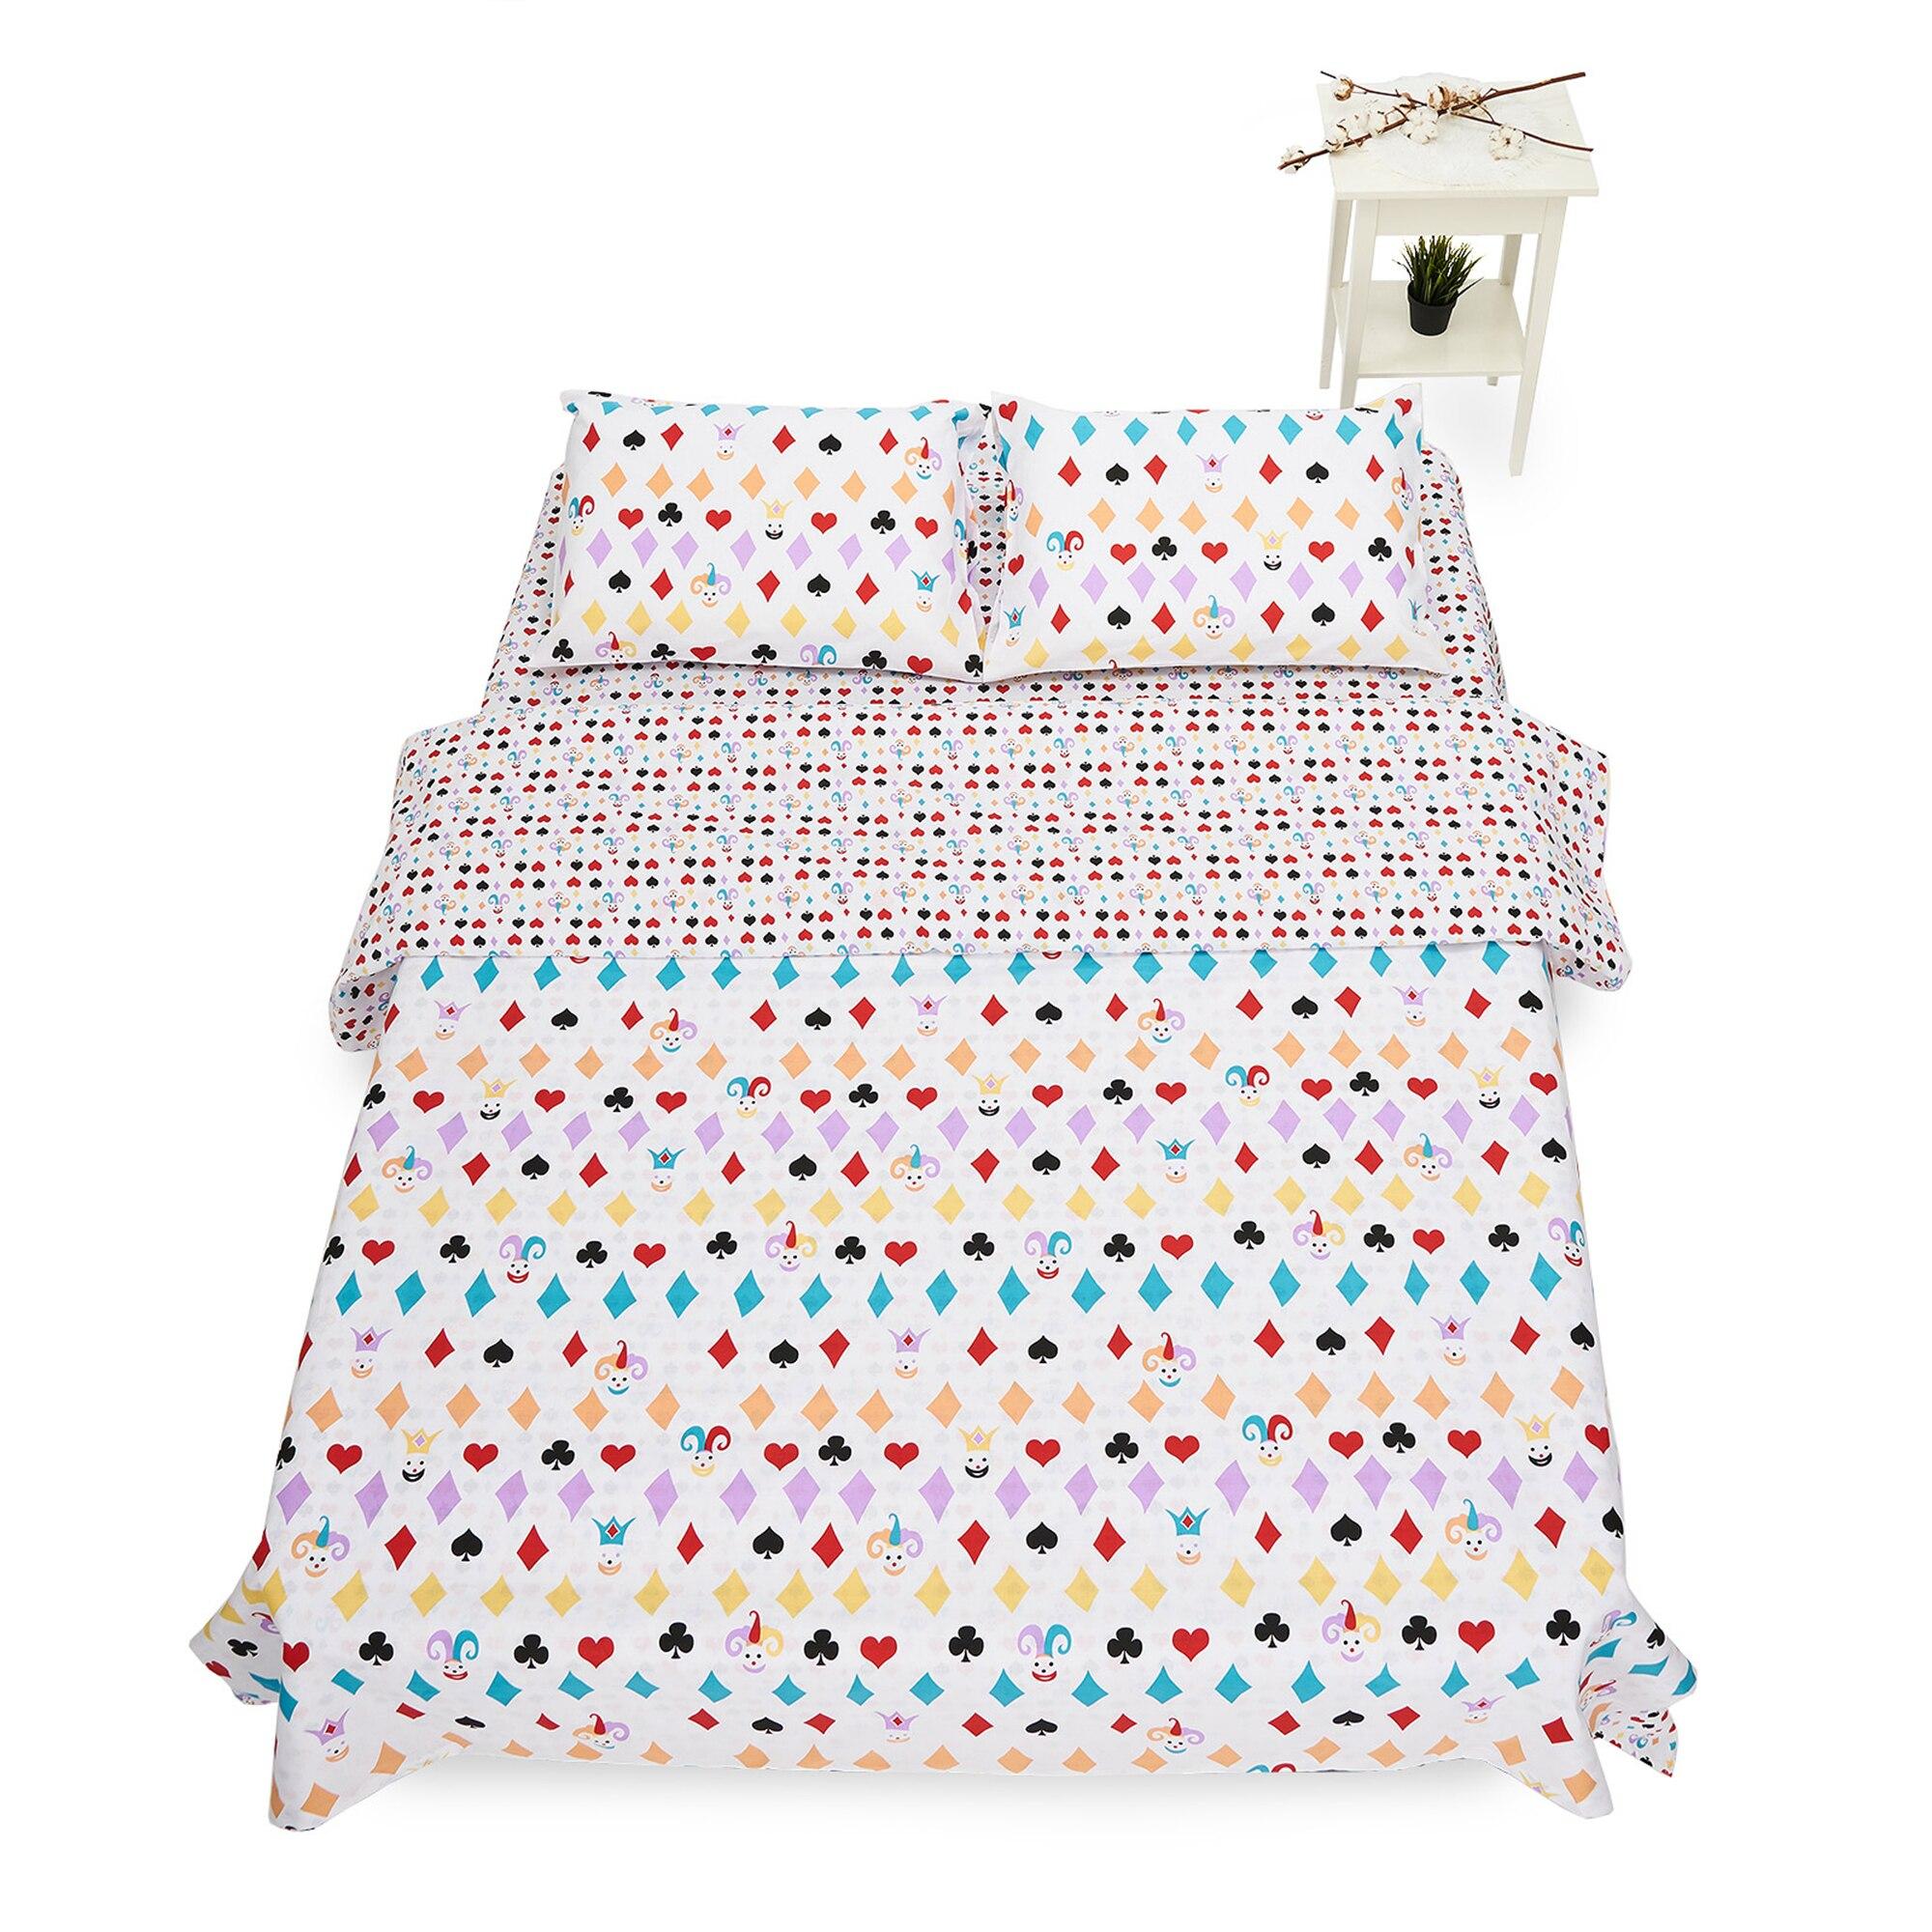 Fotografie Lenjerie de pat pentru 2 persoane Heinner Home, 100% bumbac, 4 piese, Alb/Galben